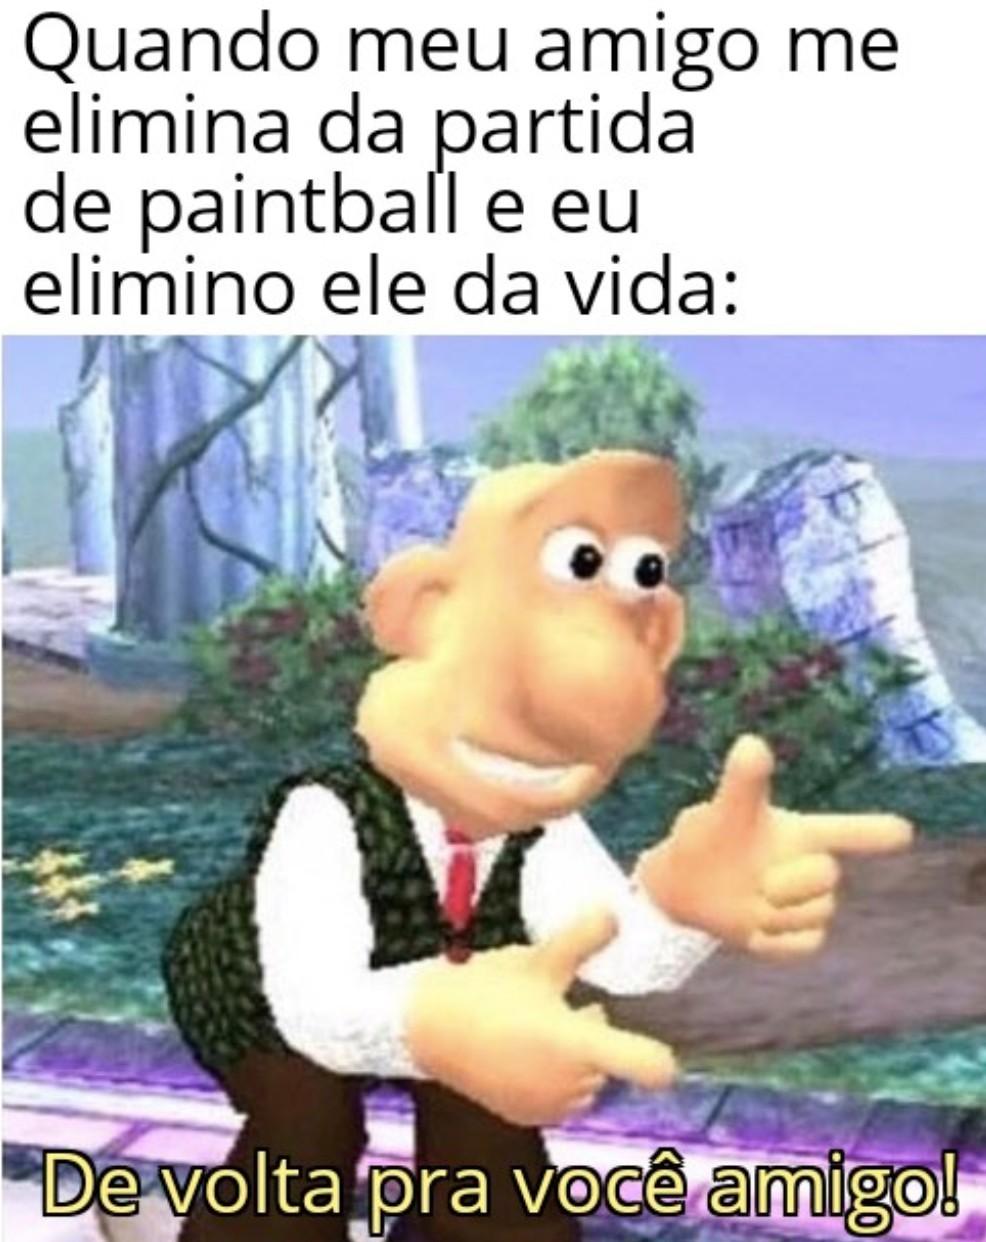 ATATATATATATATATATATATATATATATATATATATATATATATATAATATATATATATATATATATATATATATATATATATATATATATATATATATATATATATATATATATATATATATATATATATATATAATATATAT - meme